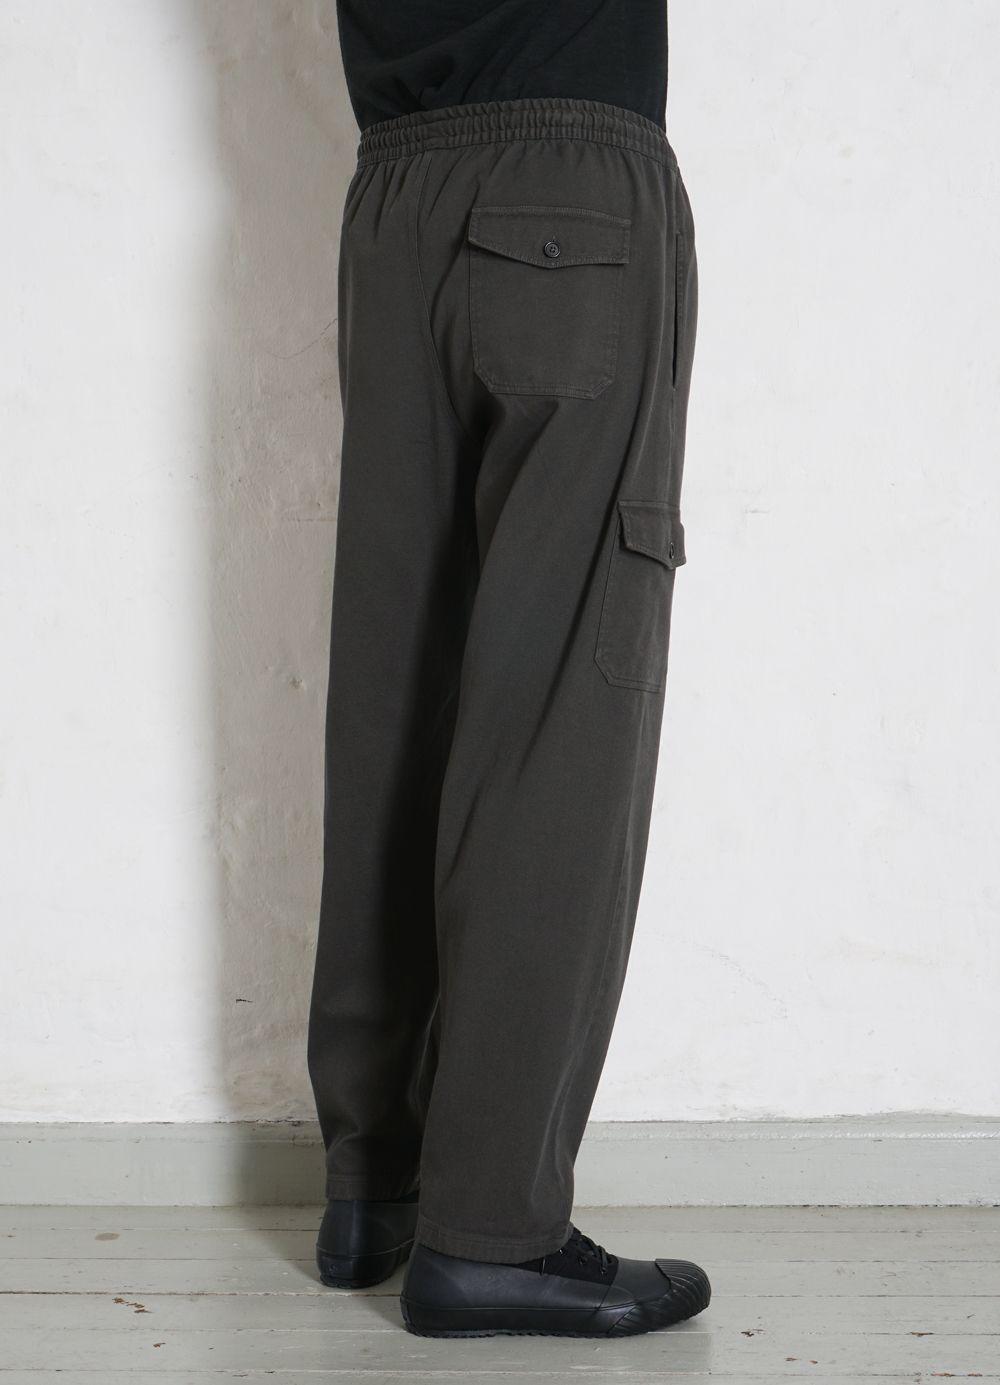 Hansen Garments JIMMY   Casual Cargo Drawstring Pants   light grey, dark forrest